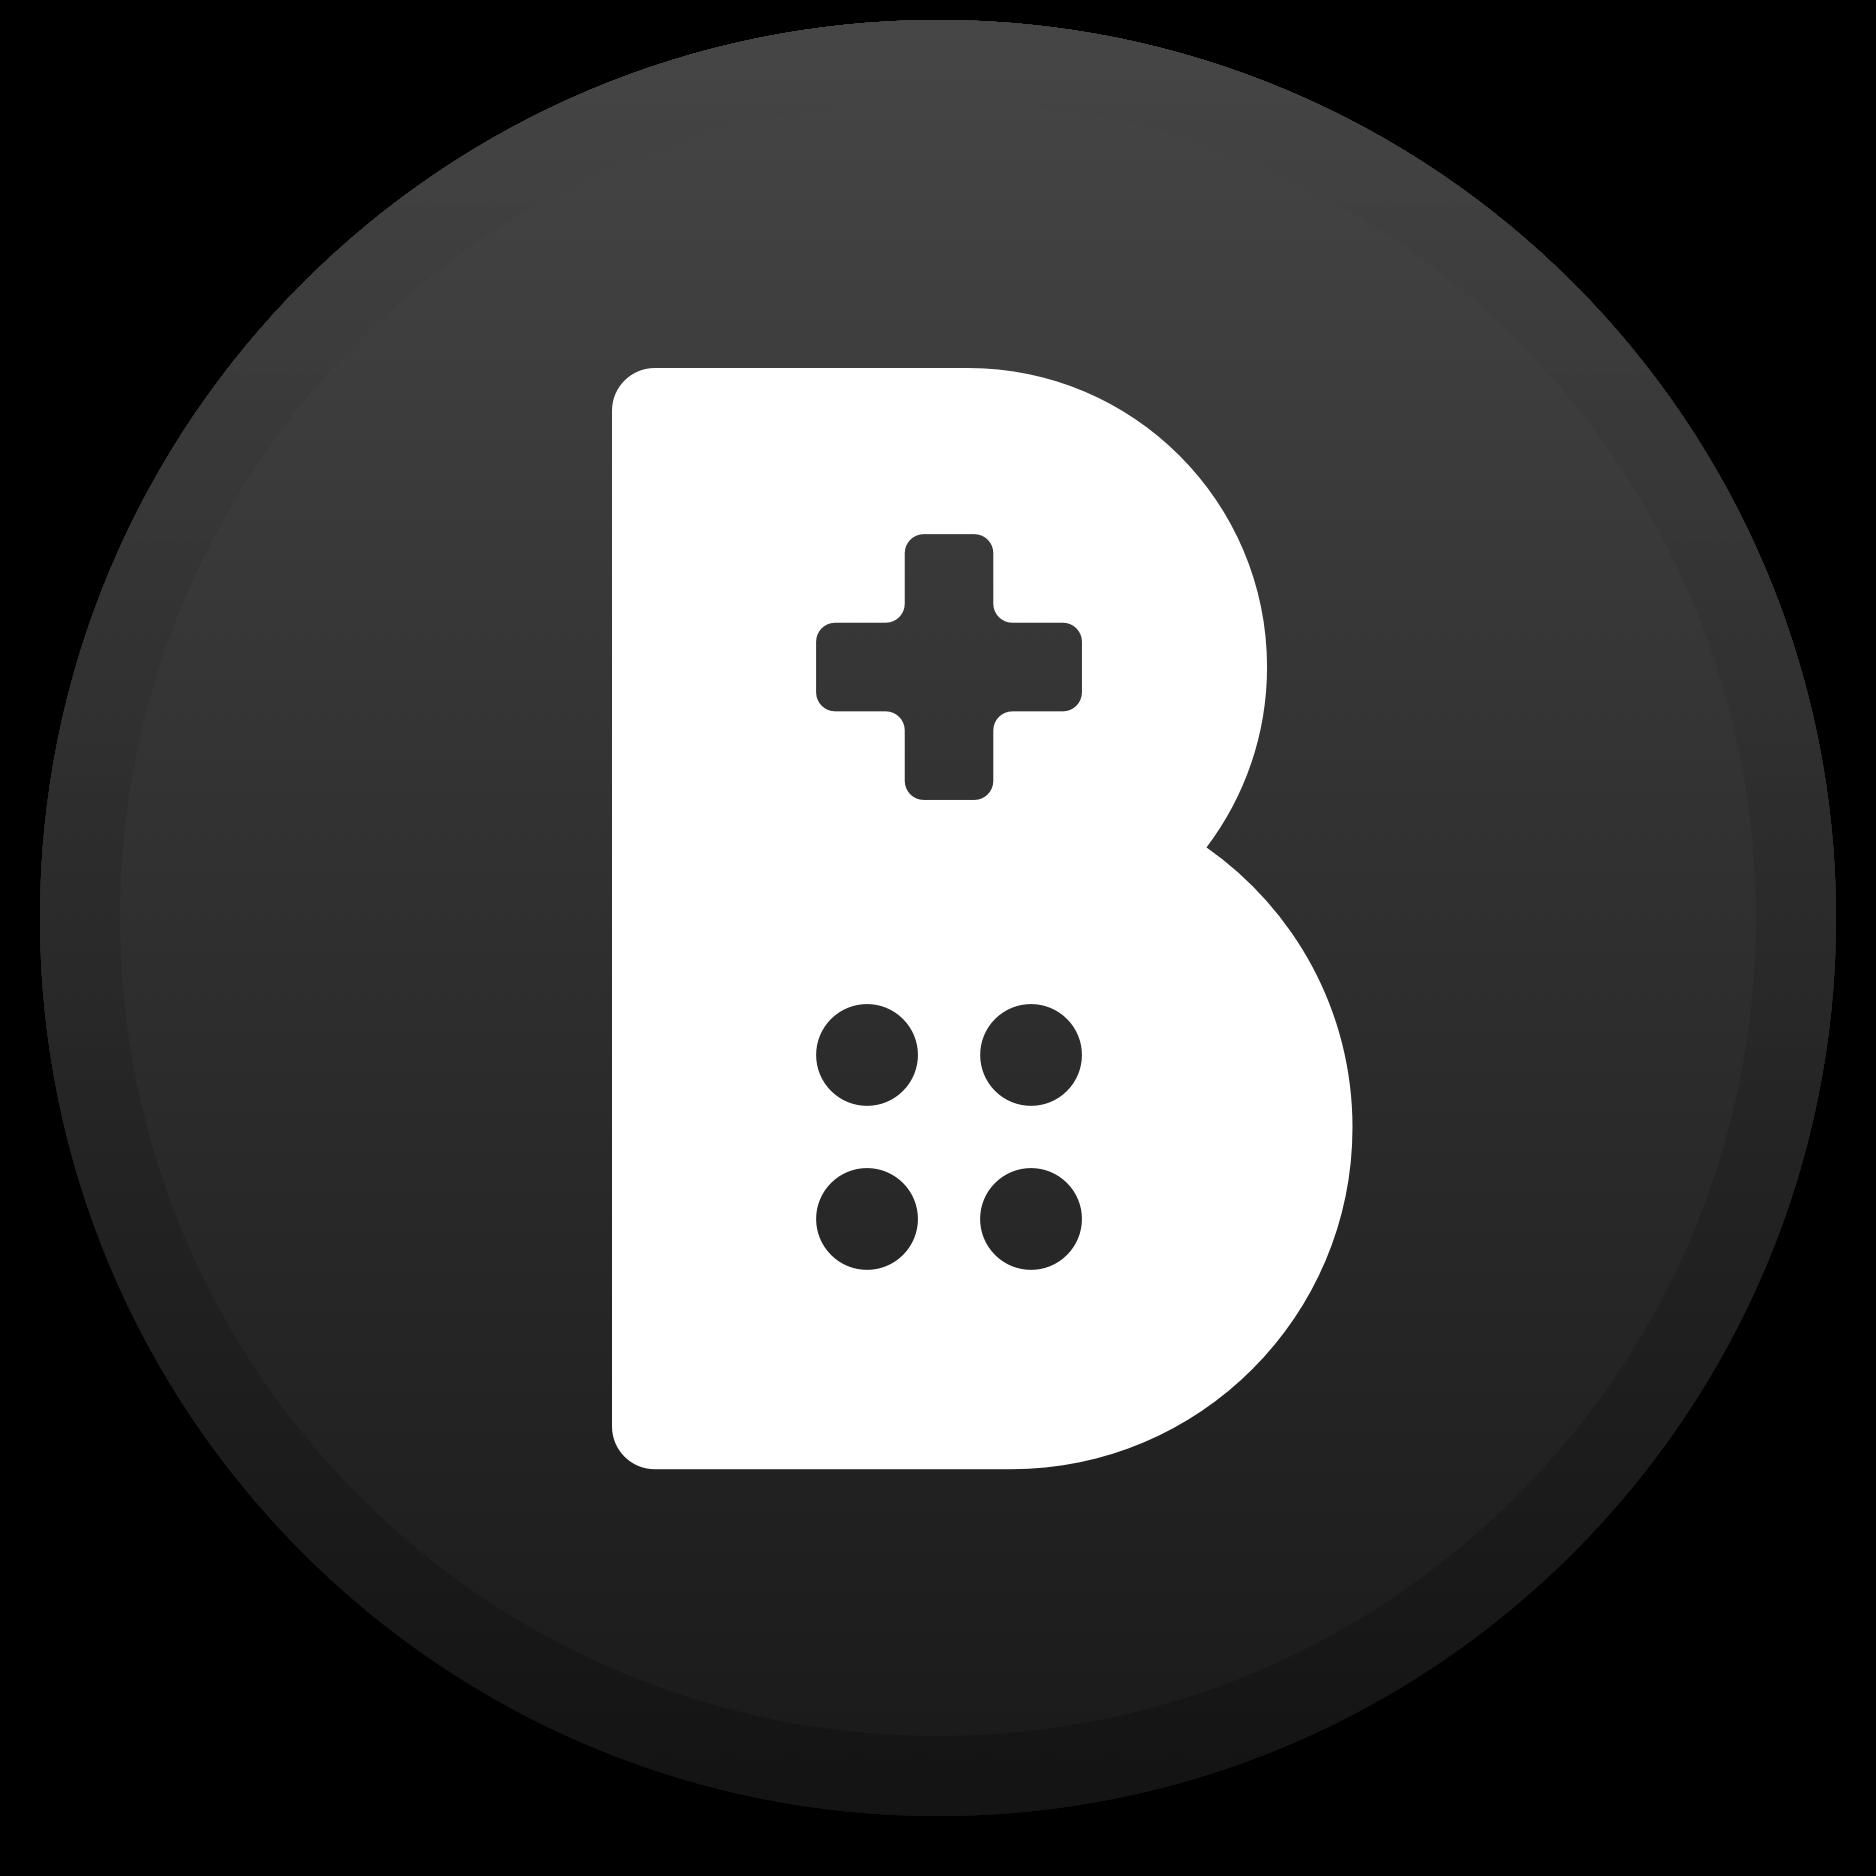 Brand.app